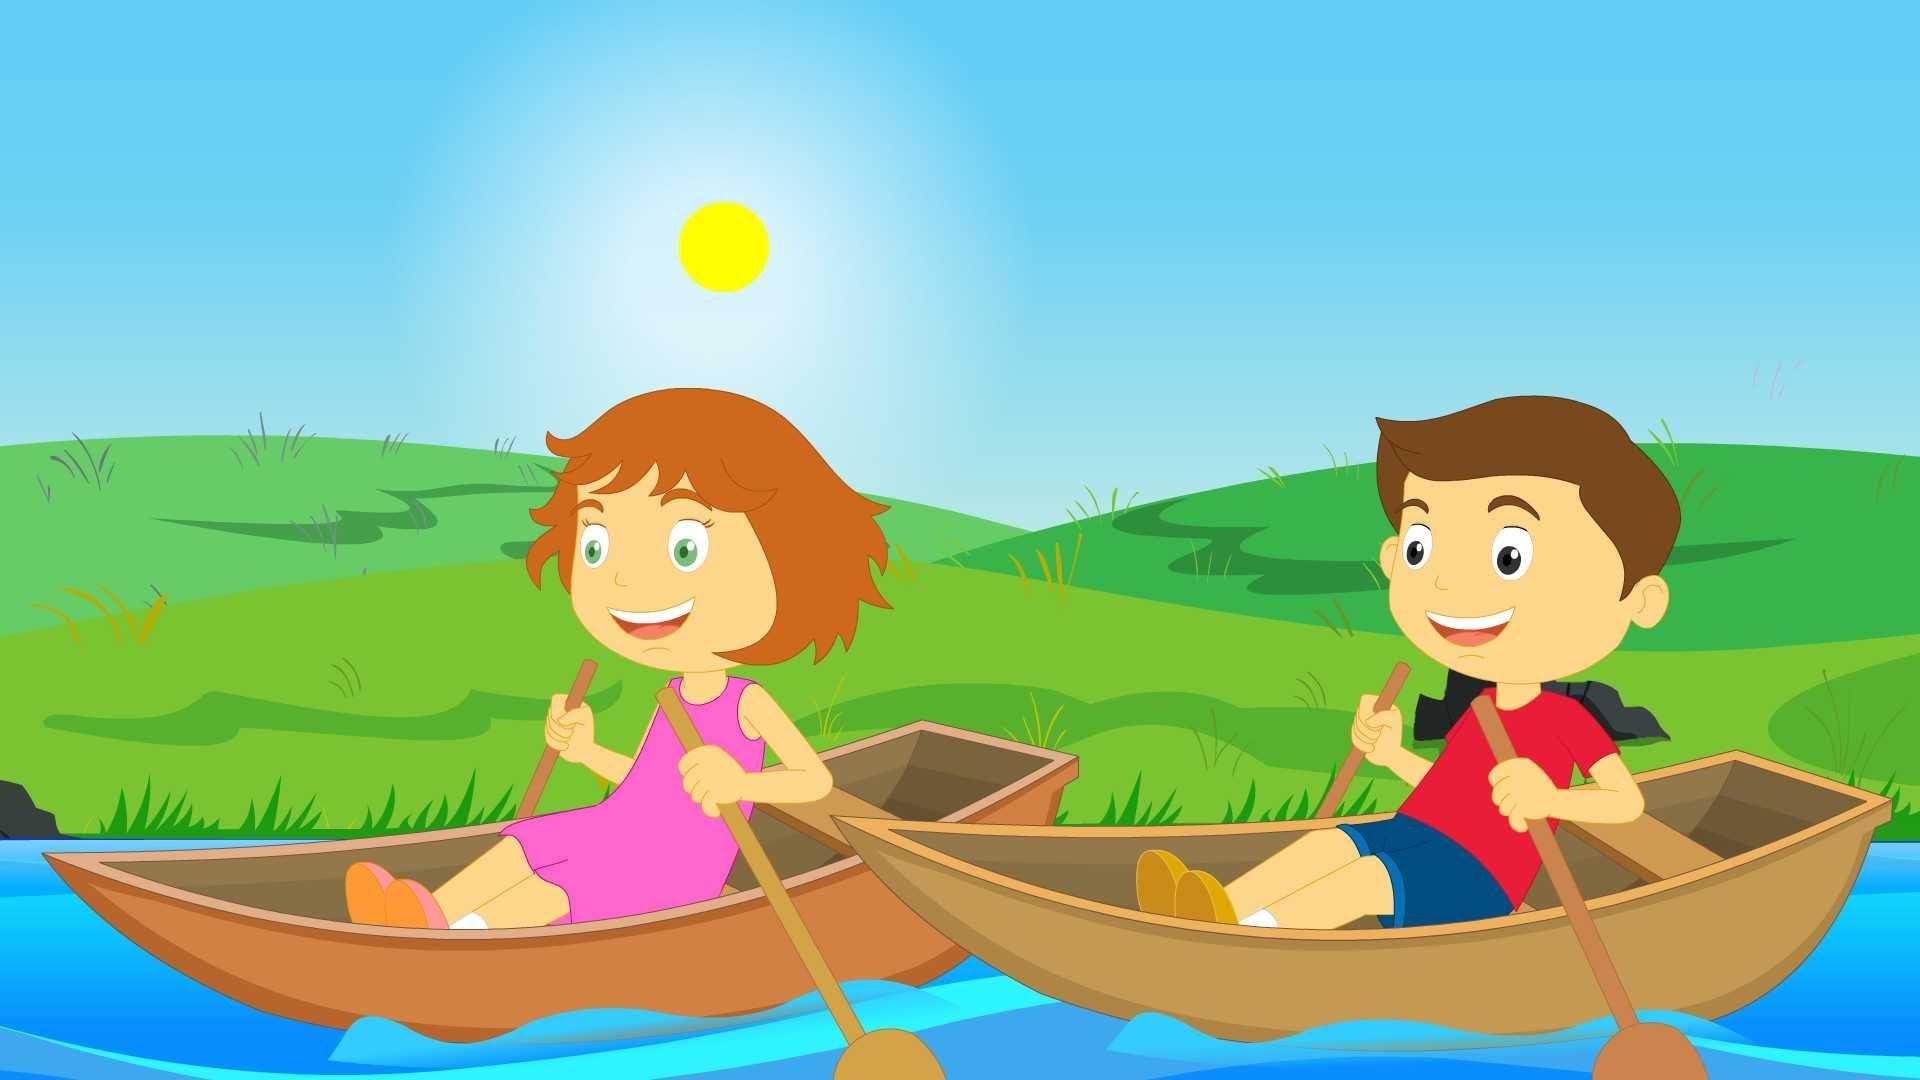 Row row row your boat clipart clip royalty free library Row row row your boat clipart - ClipartFest clip royalty free library